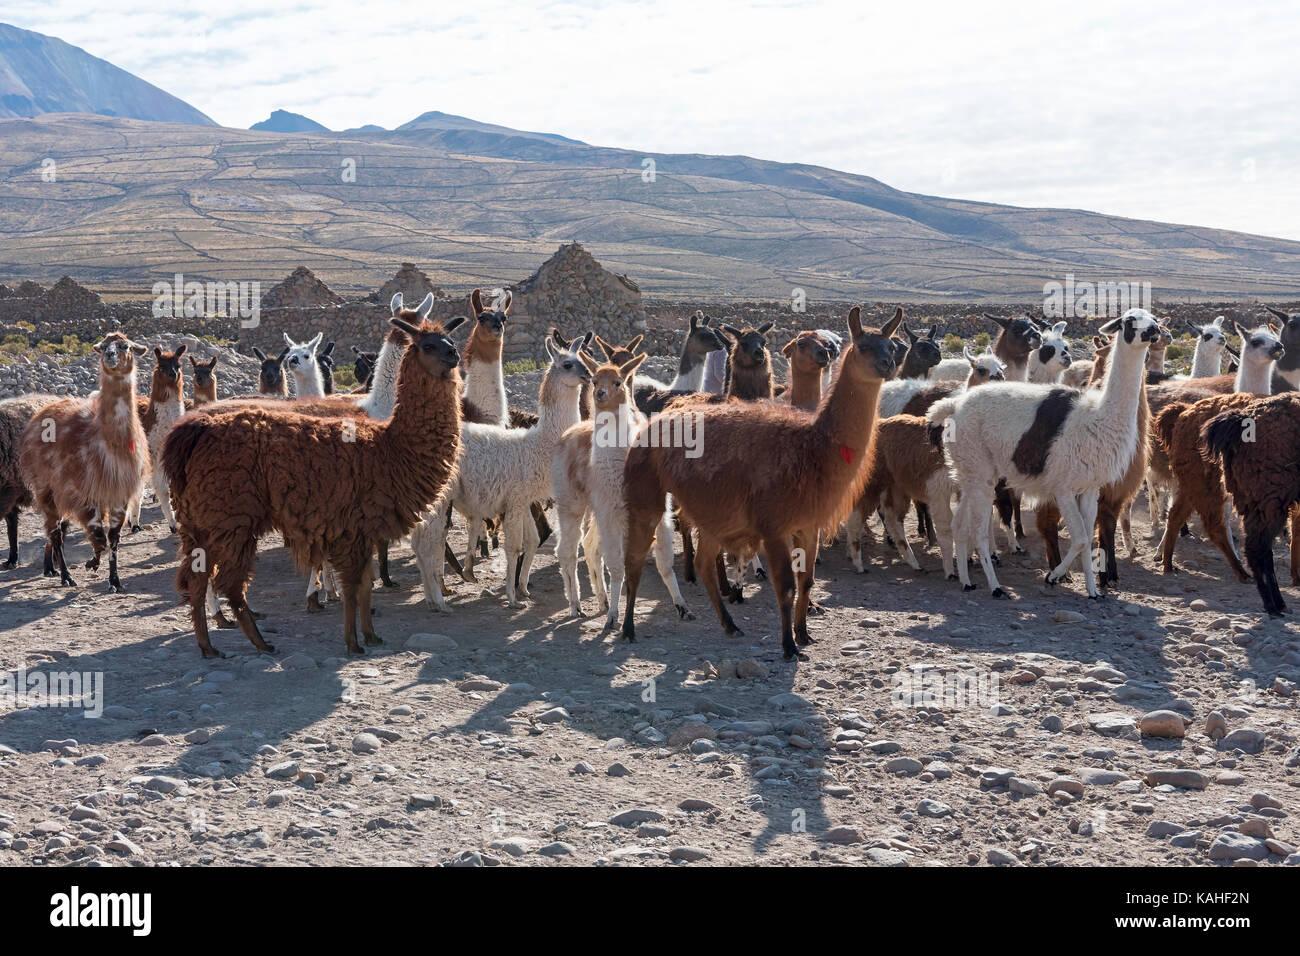 Llamas (Lama glama), herd in barren landscape, Altiplano, Andes, Colchani, Potosí, Bolivia - Stock Image